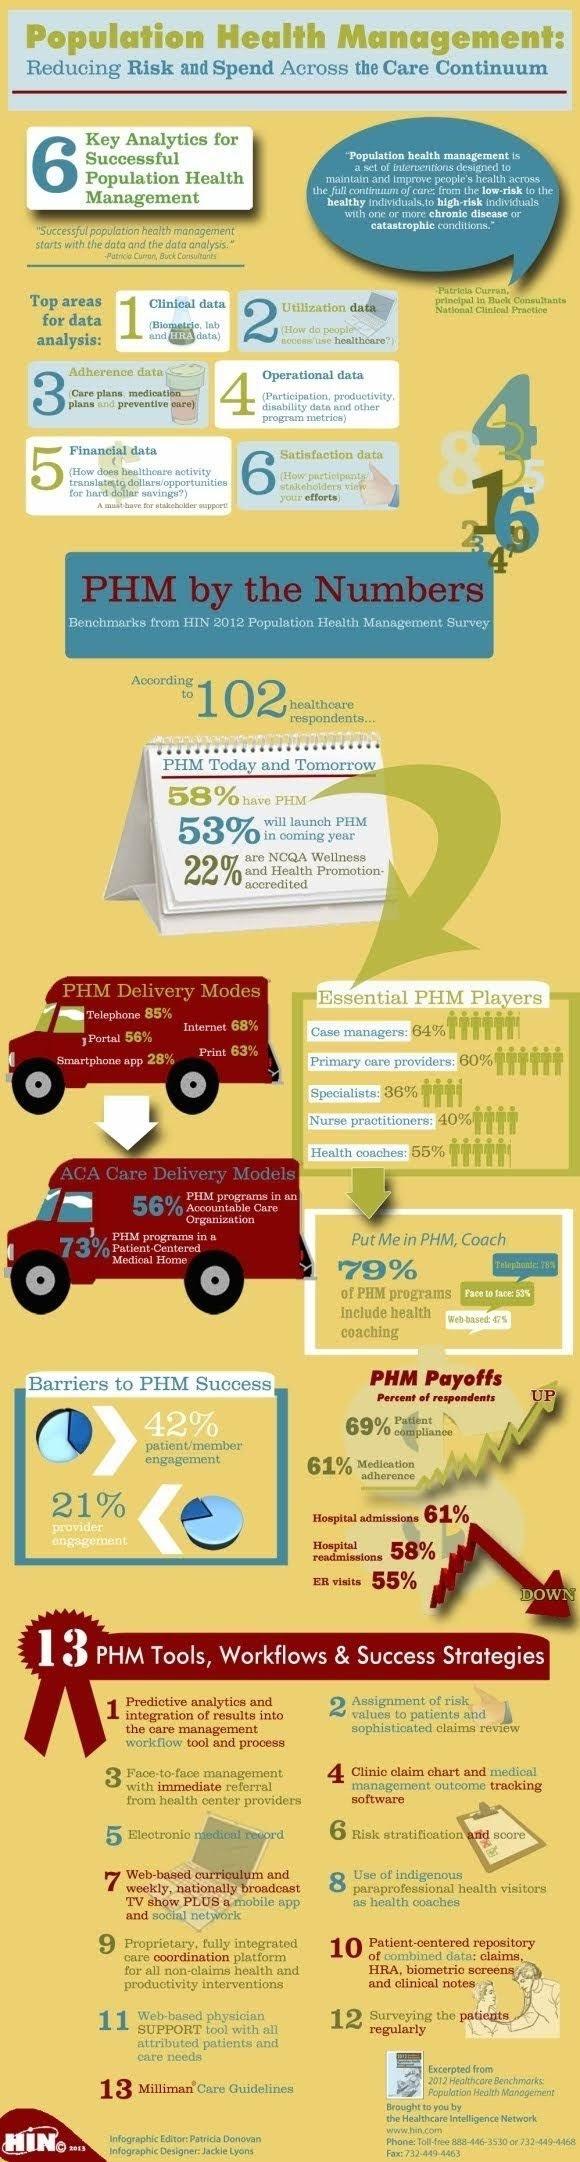 Population Health Management #infographic